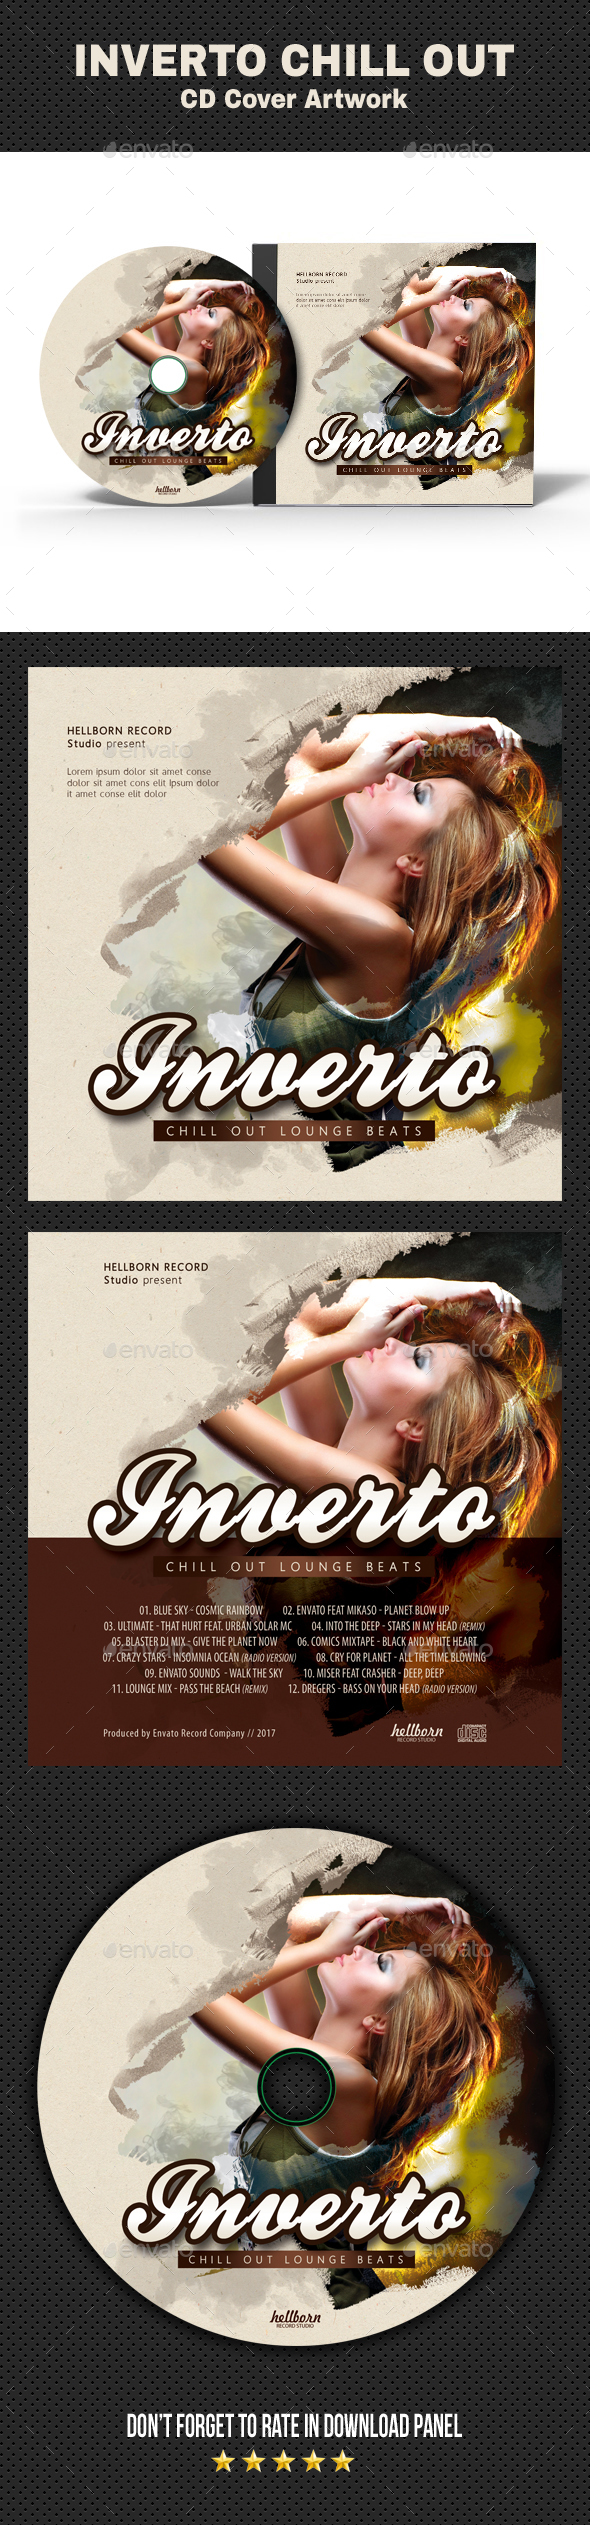 Inverto Music CD Cover 2 - CD & DVD Artwork Print Templates